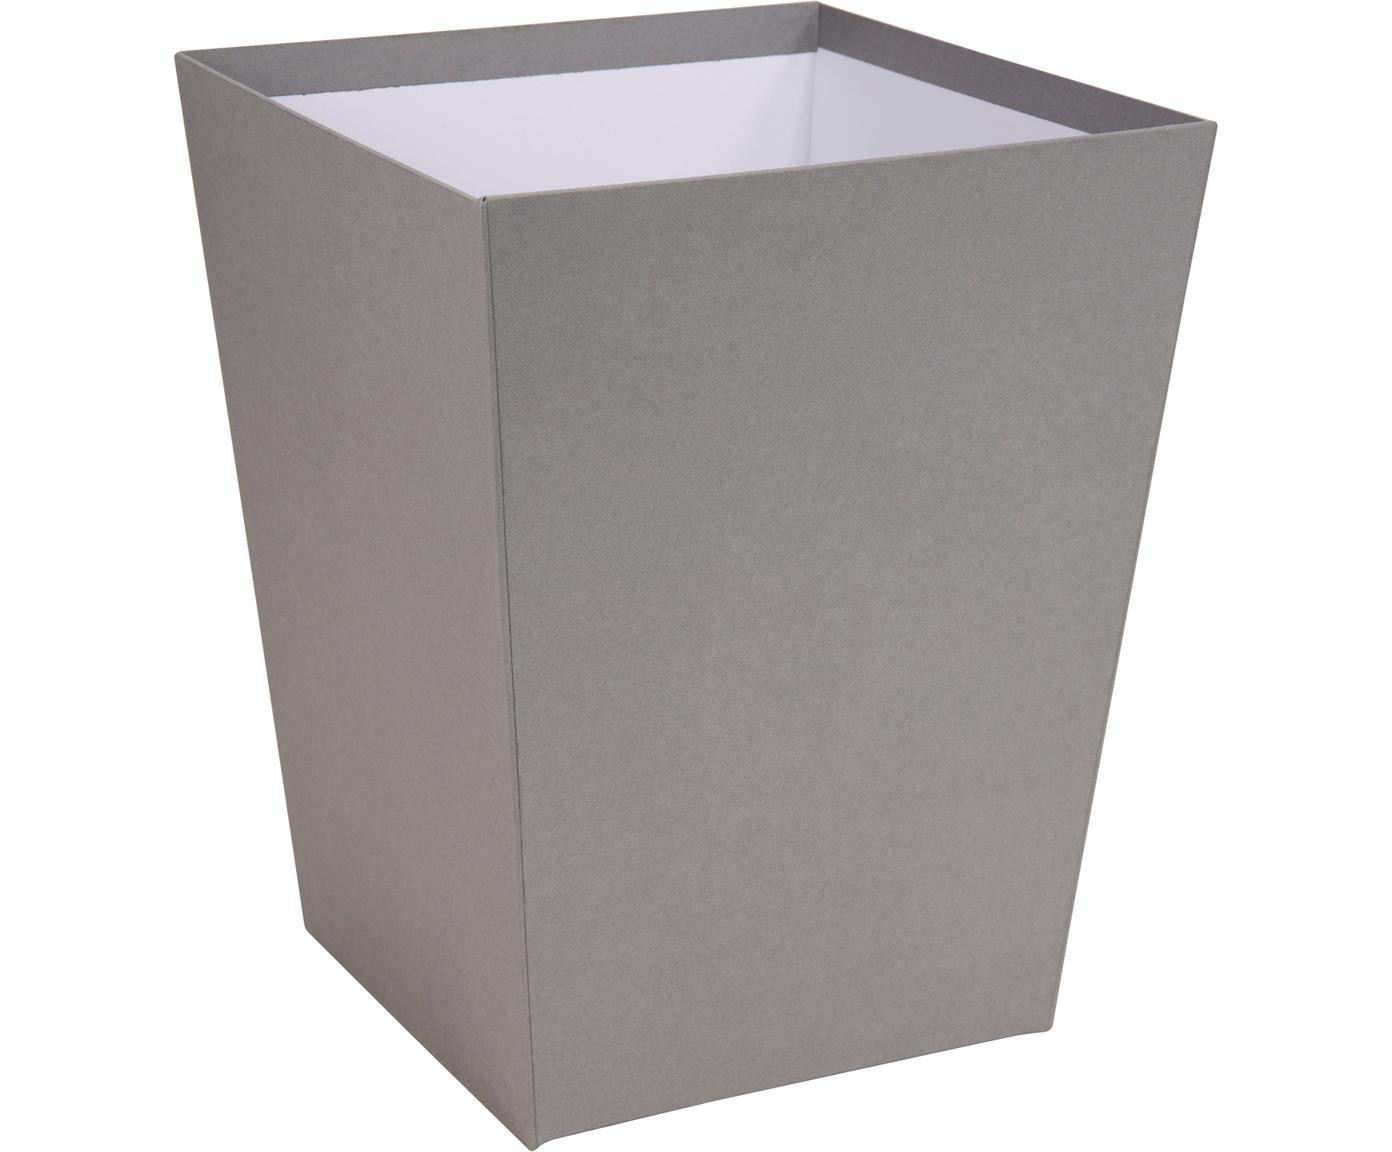 Papierkorb Sofia, Fester, laminierter Karton, Grau, 26 x 33 cm